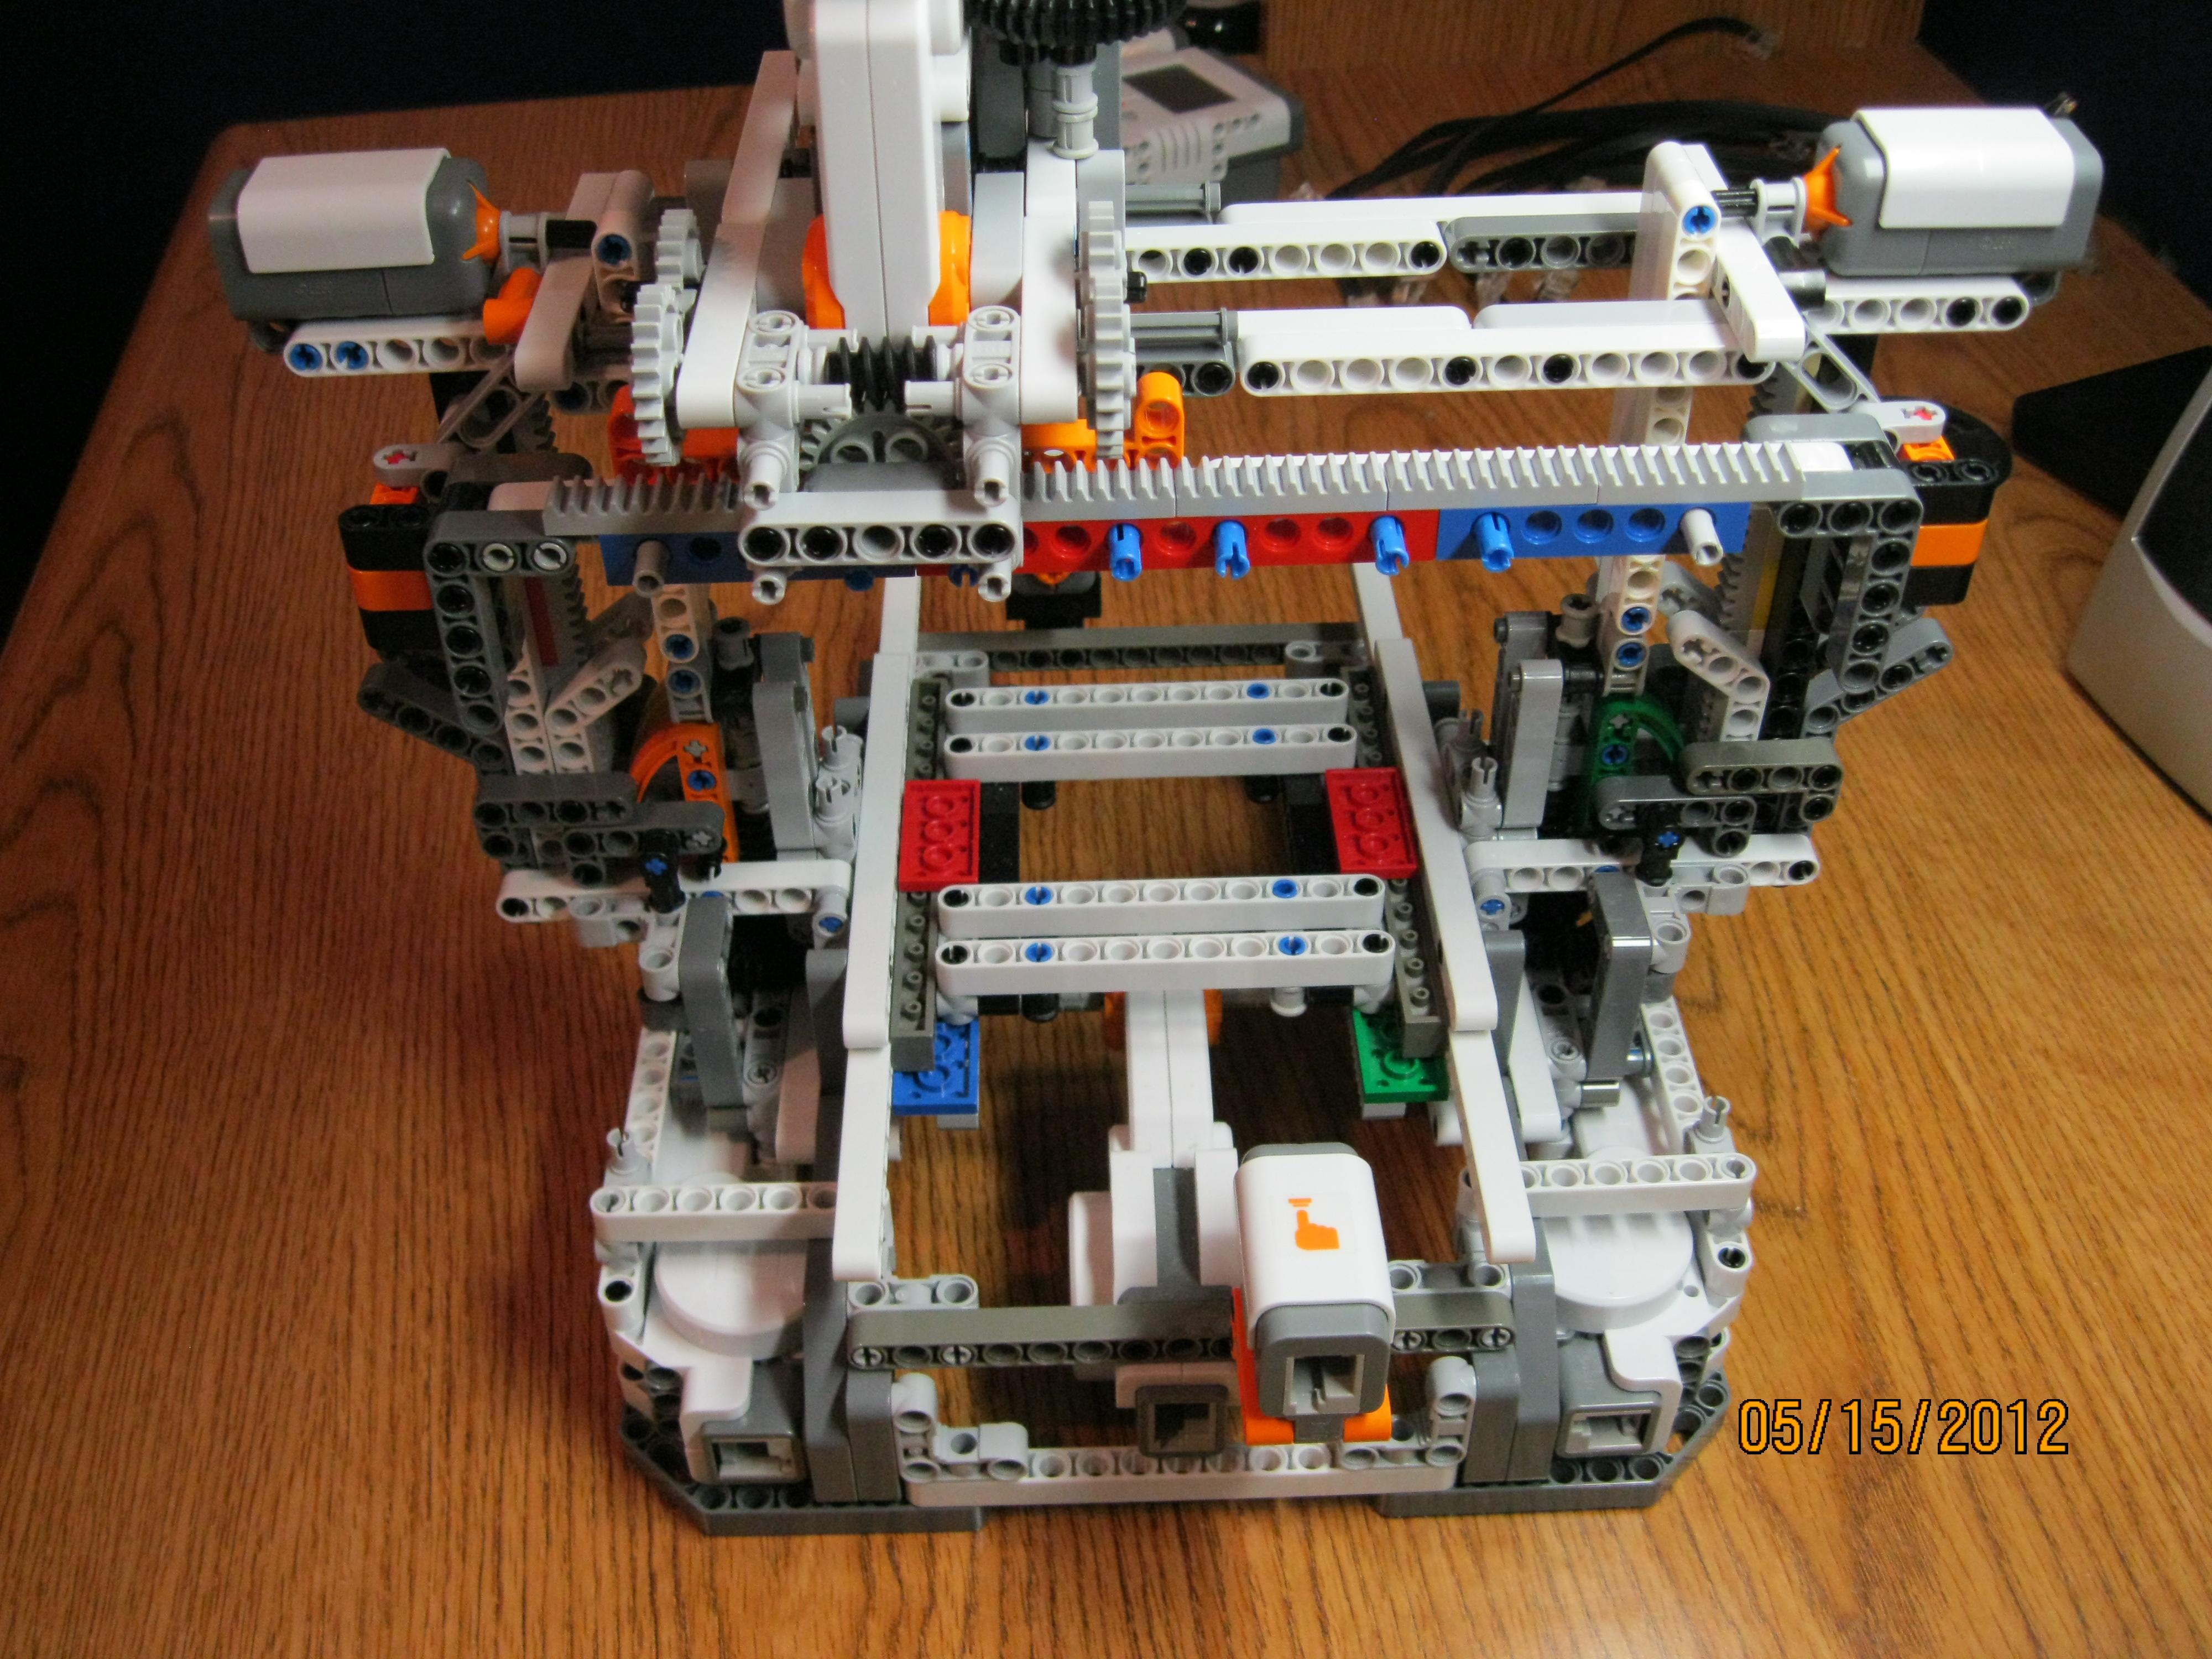 Lego CNC/3D printer/plotter